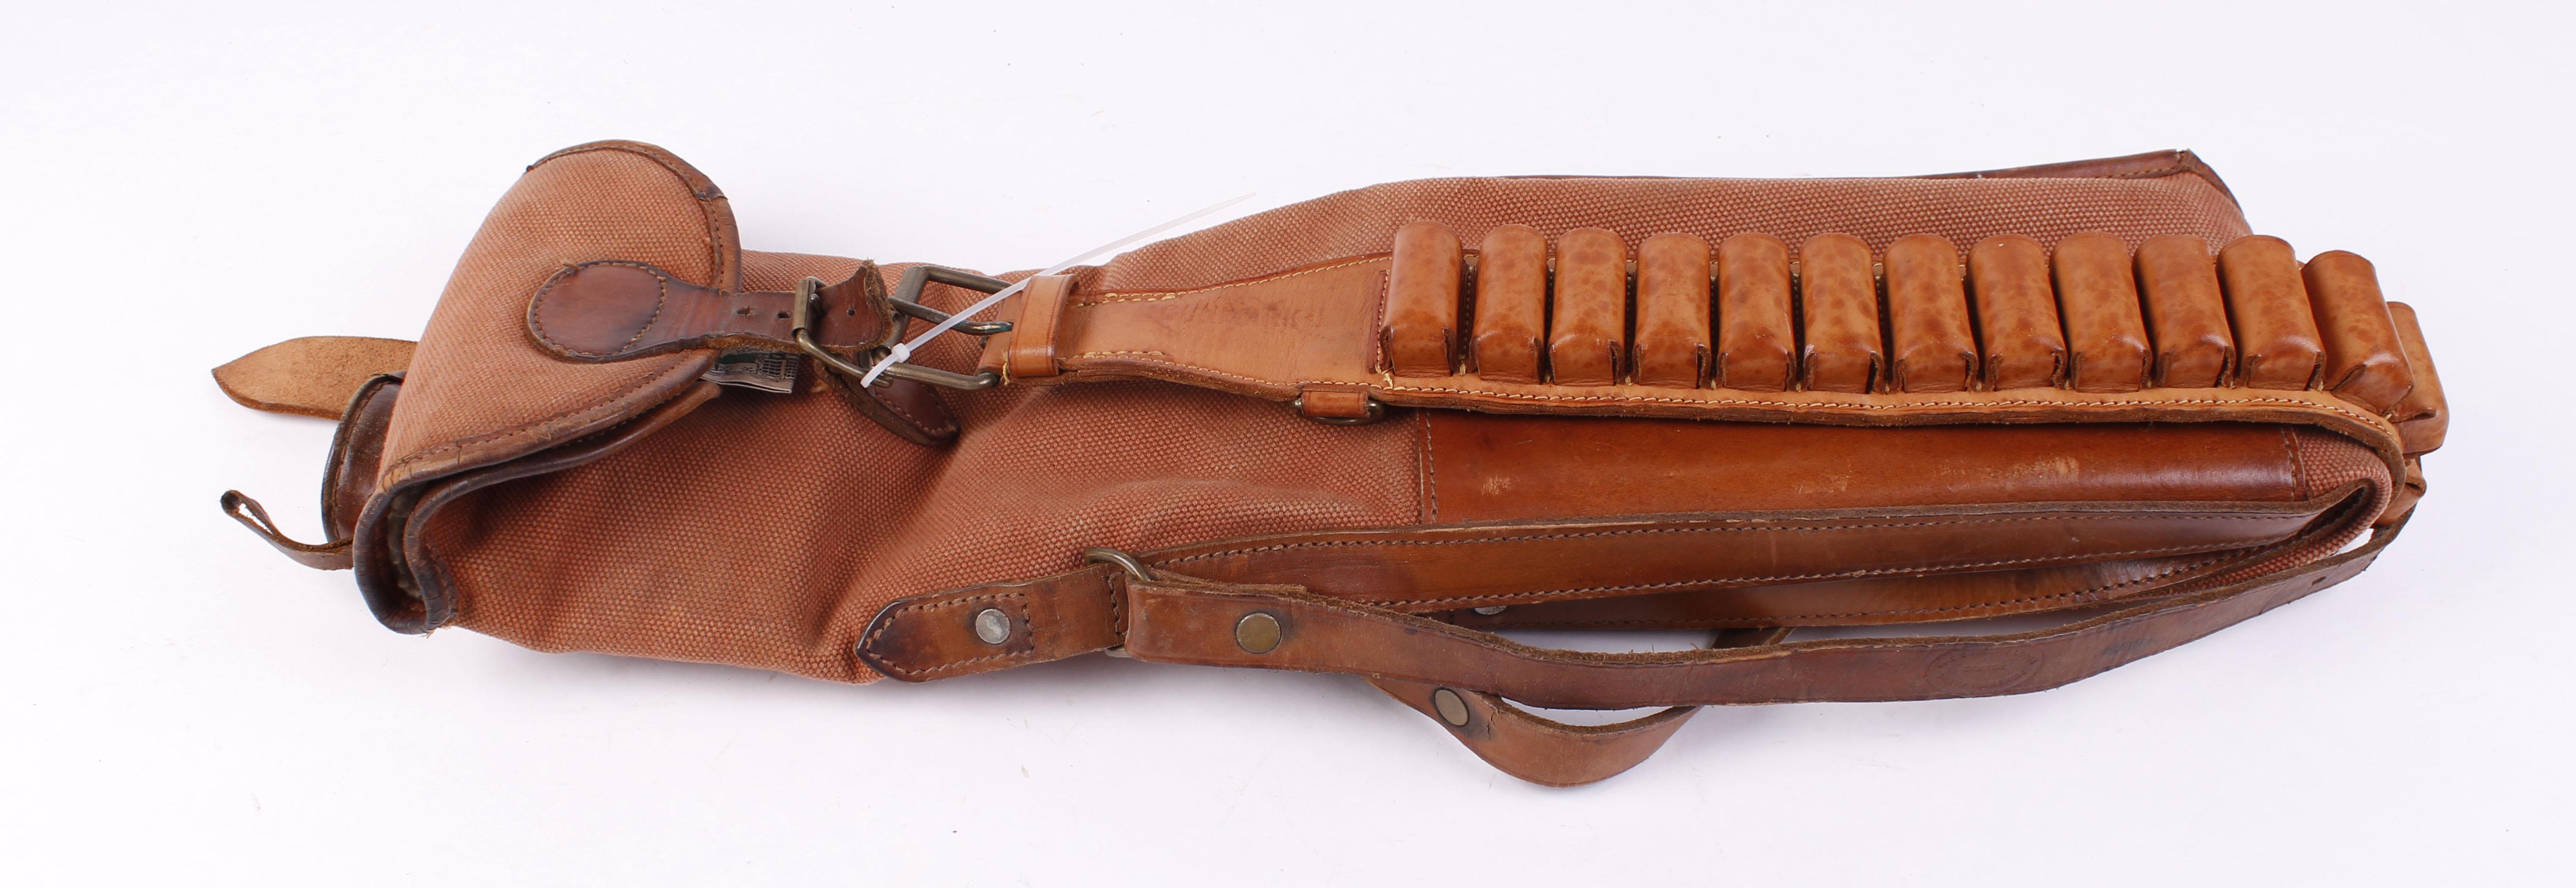 Lot 49 - Gunmark tan leather 12 bore cartridge belt; Canvas and leather fleece lined 48 ins gun slip